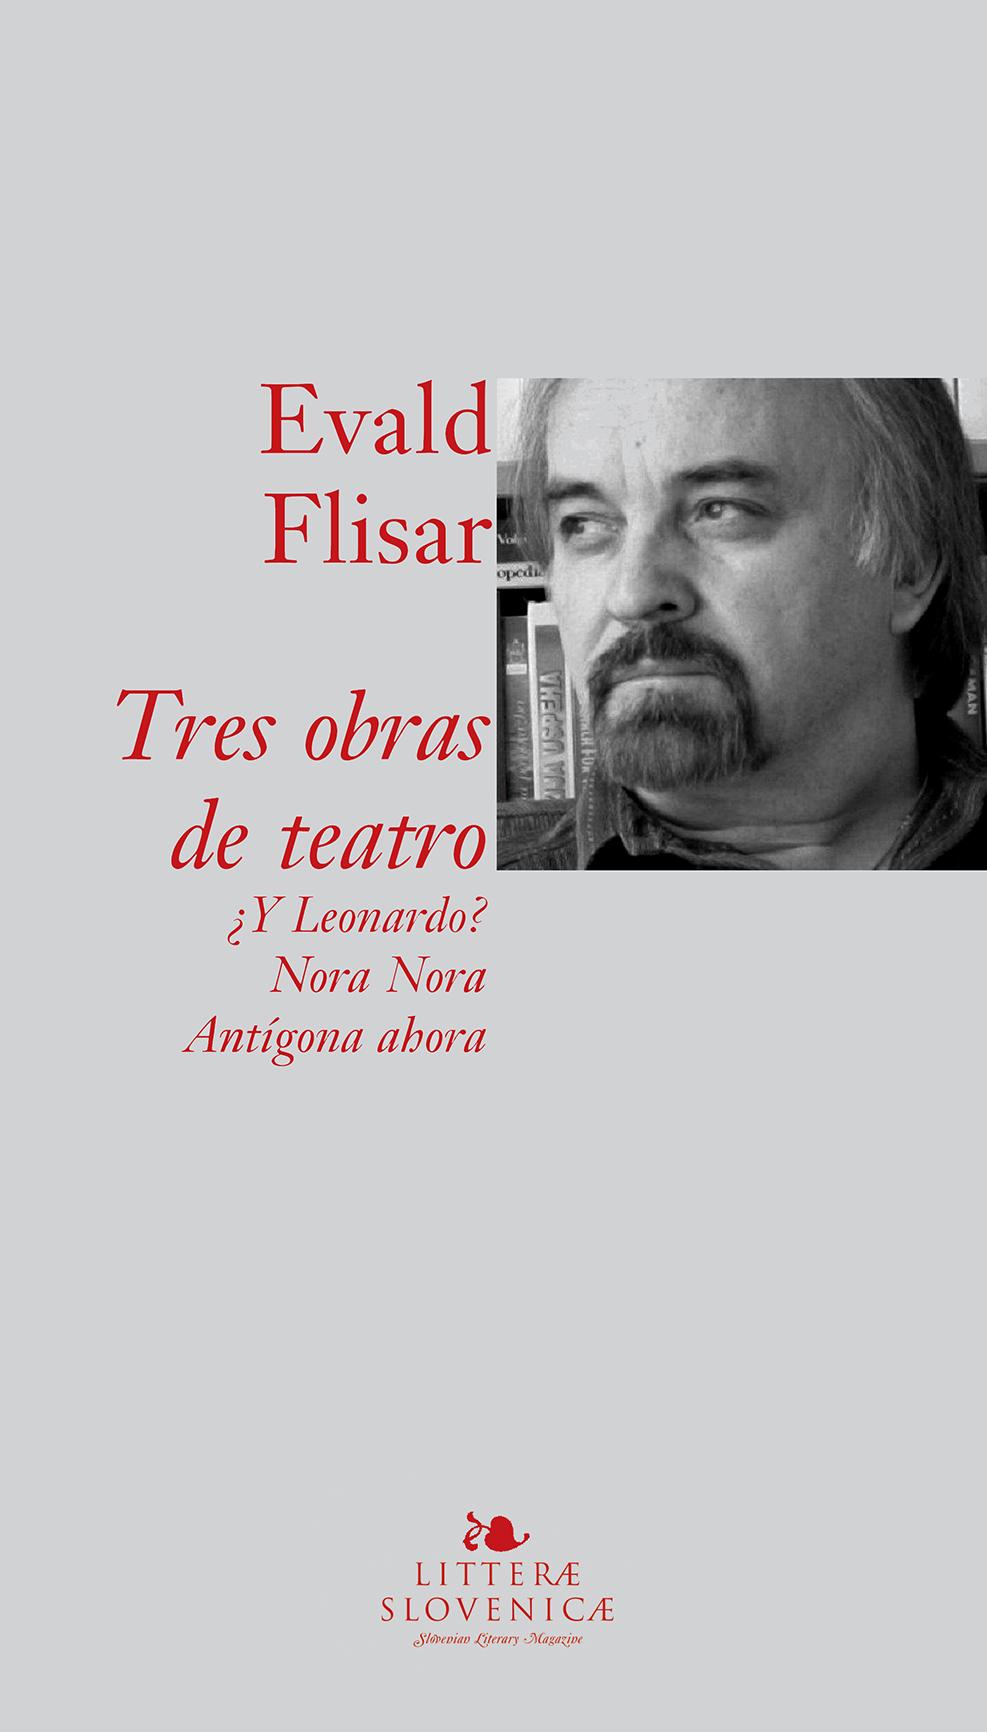 nasl-flisar-1.jpg